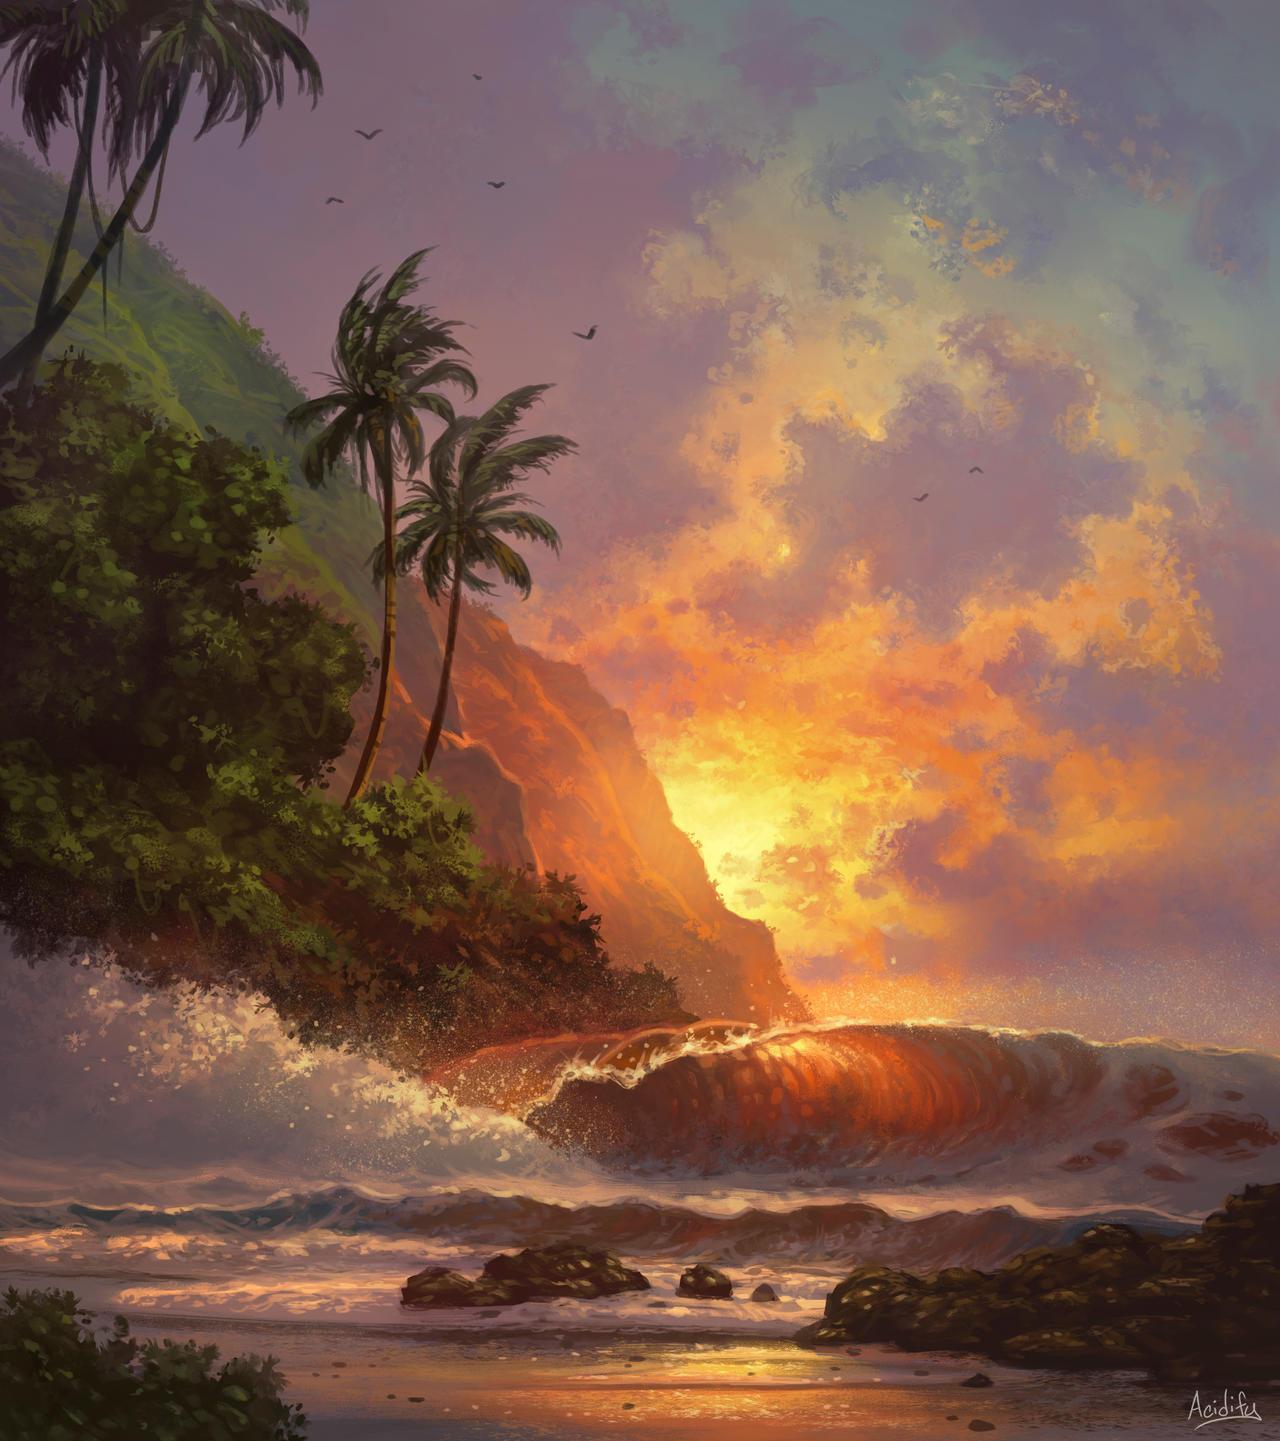 Hawaii (Beach Landscape / Seascape Study)